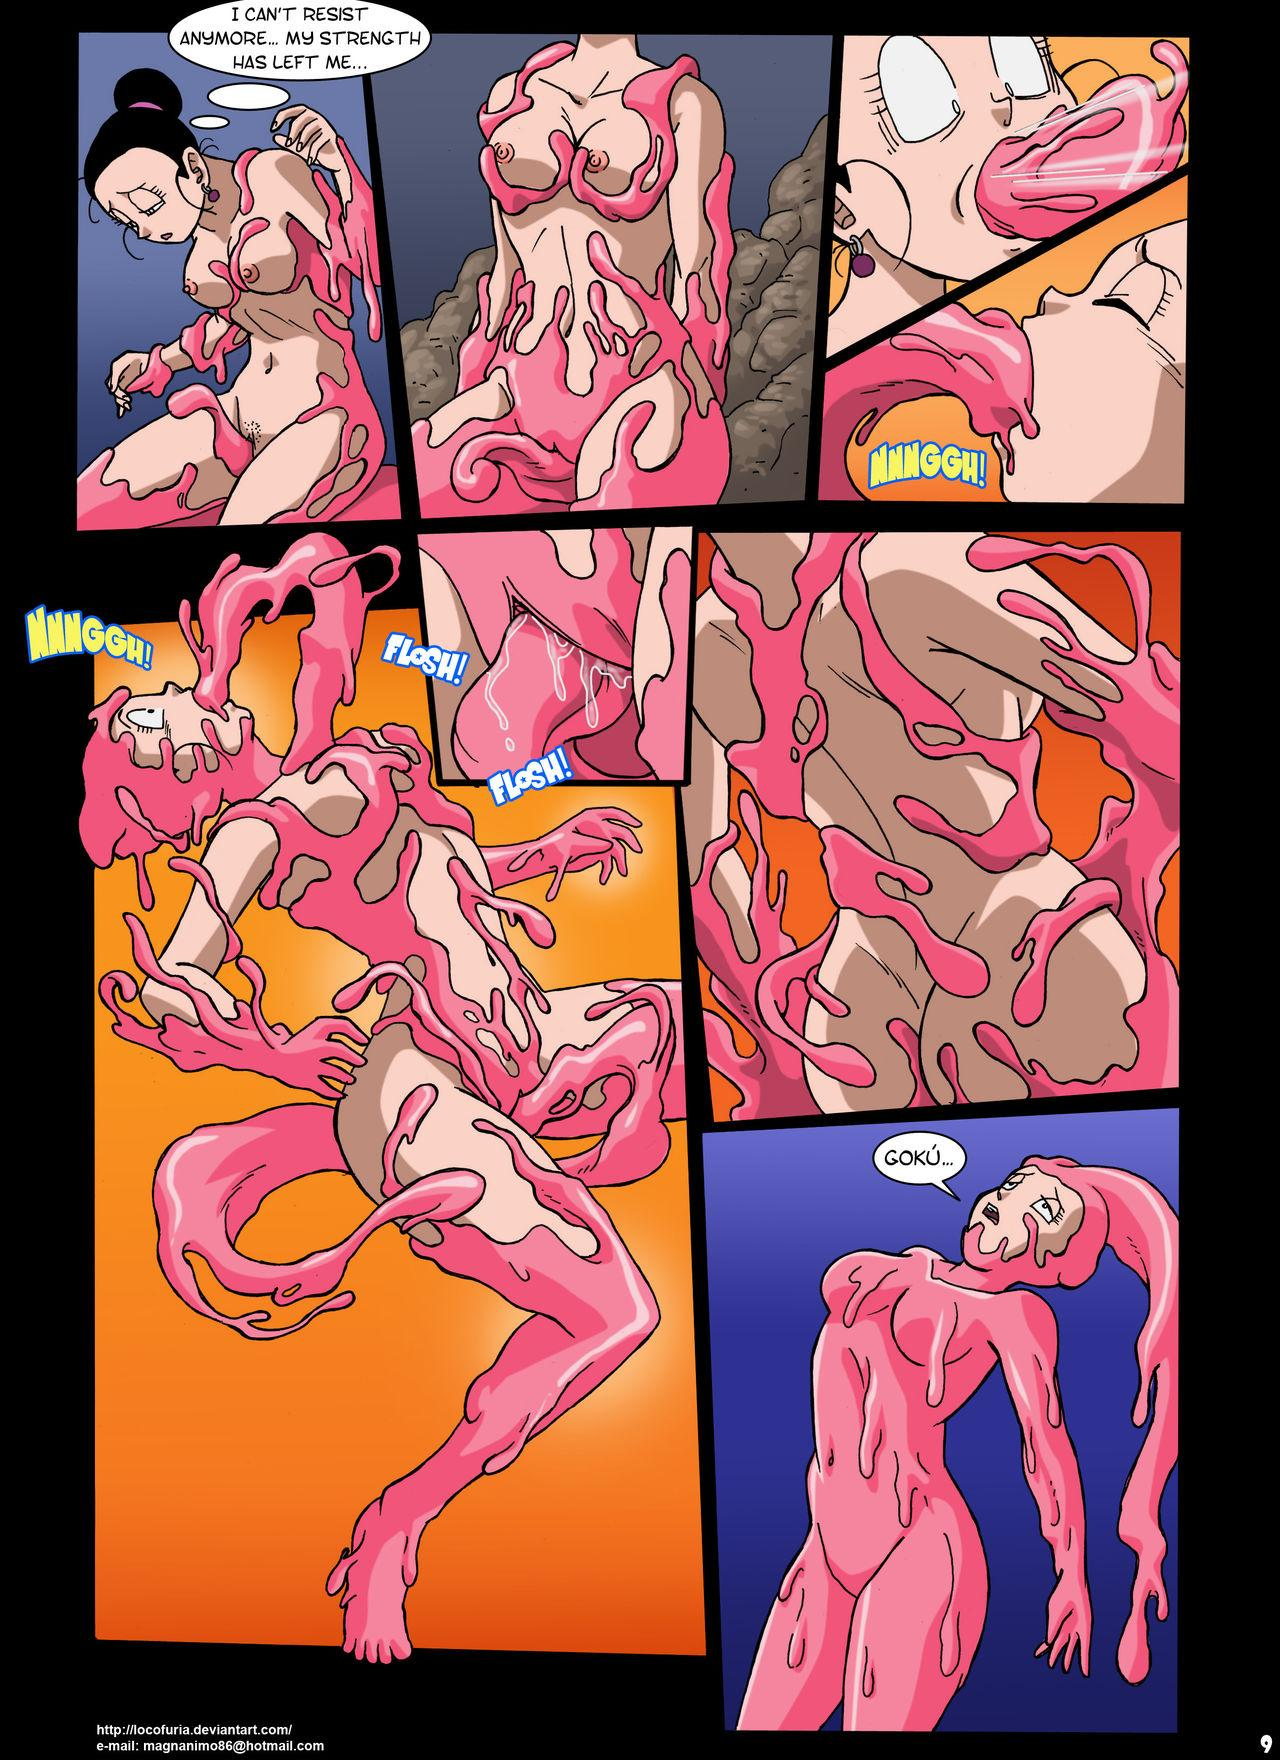 Buu's Bodies #1 - Milk 10